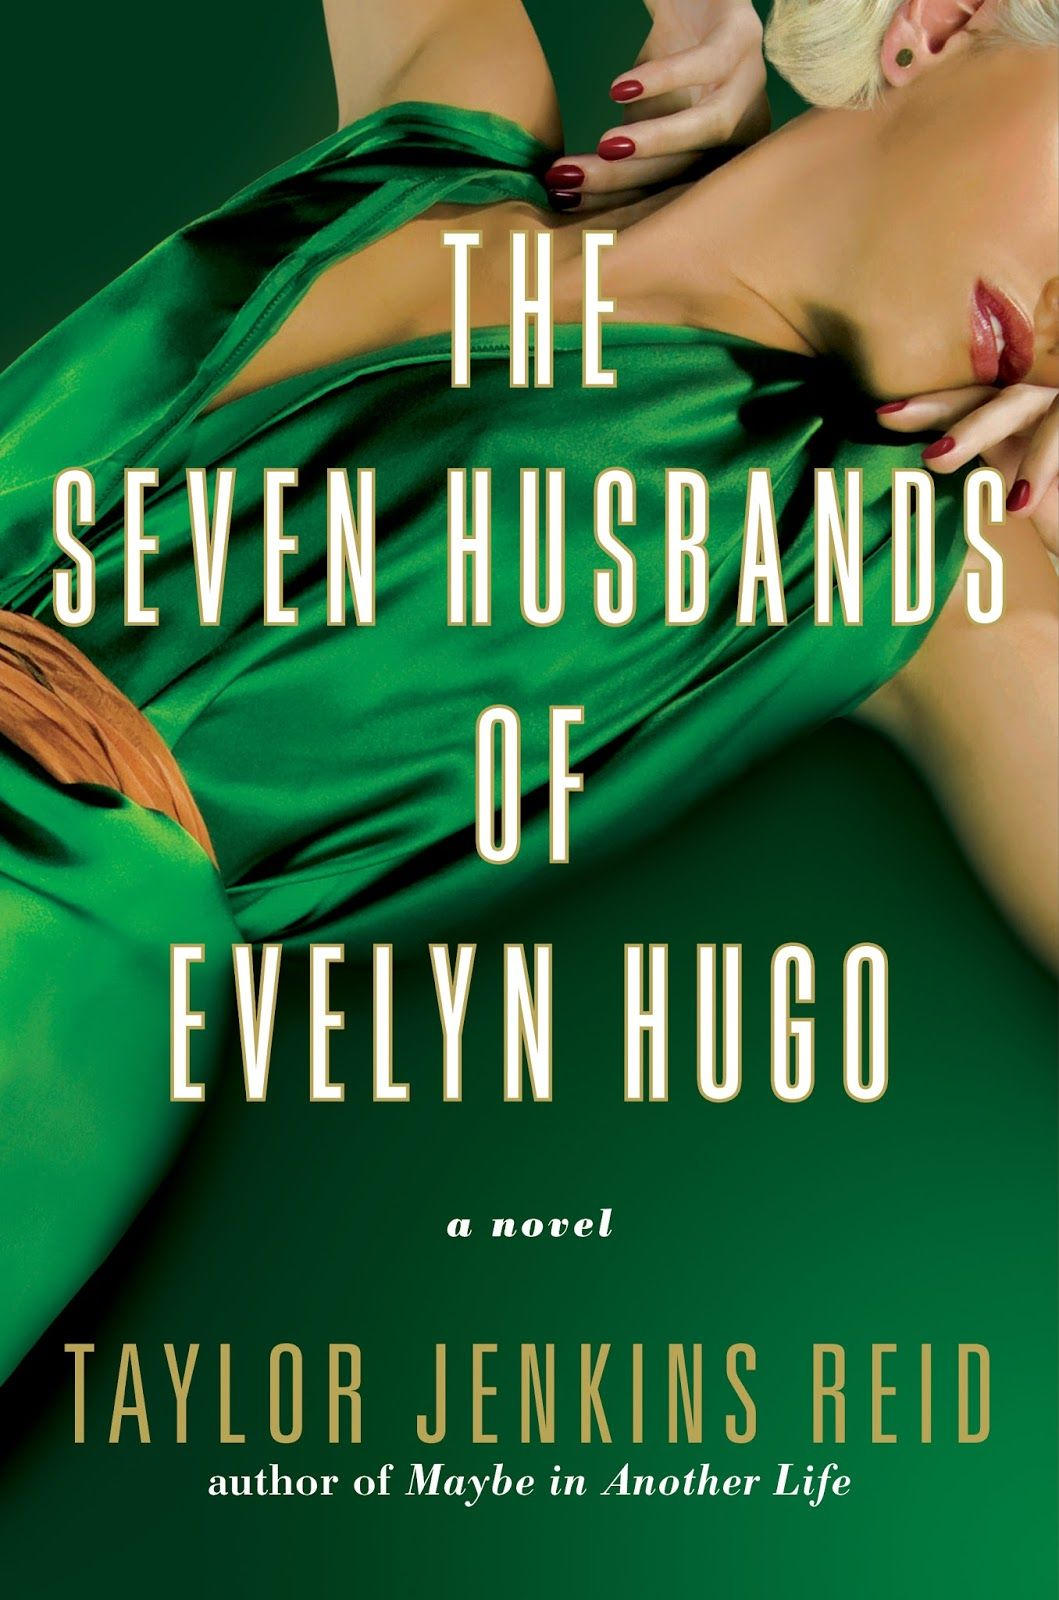 Download Pdf The Seven Husbands Of Evelyn Hugo By Taylor Jenkins Reid Hugo Book Historical Fiction Books Book Club Books